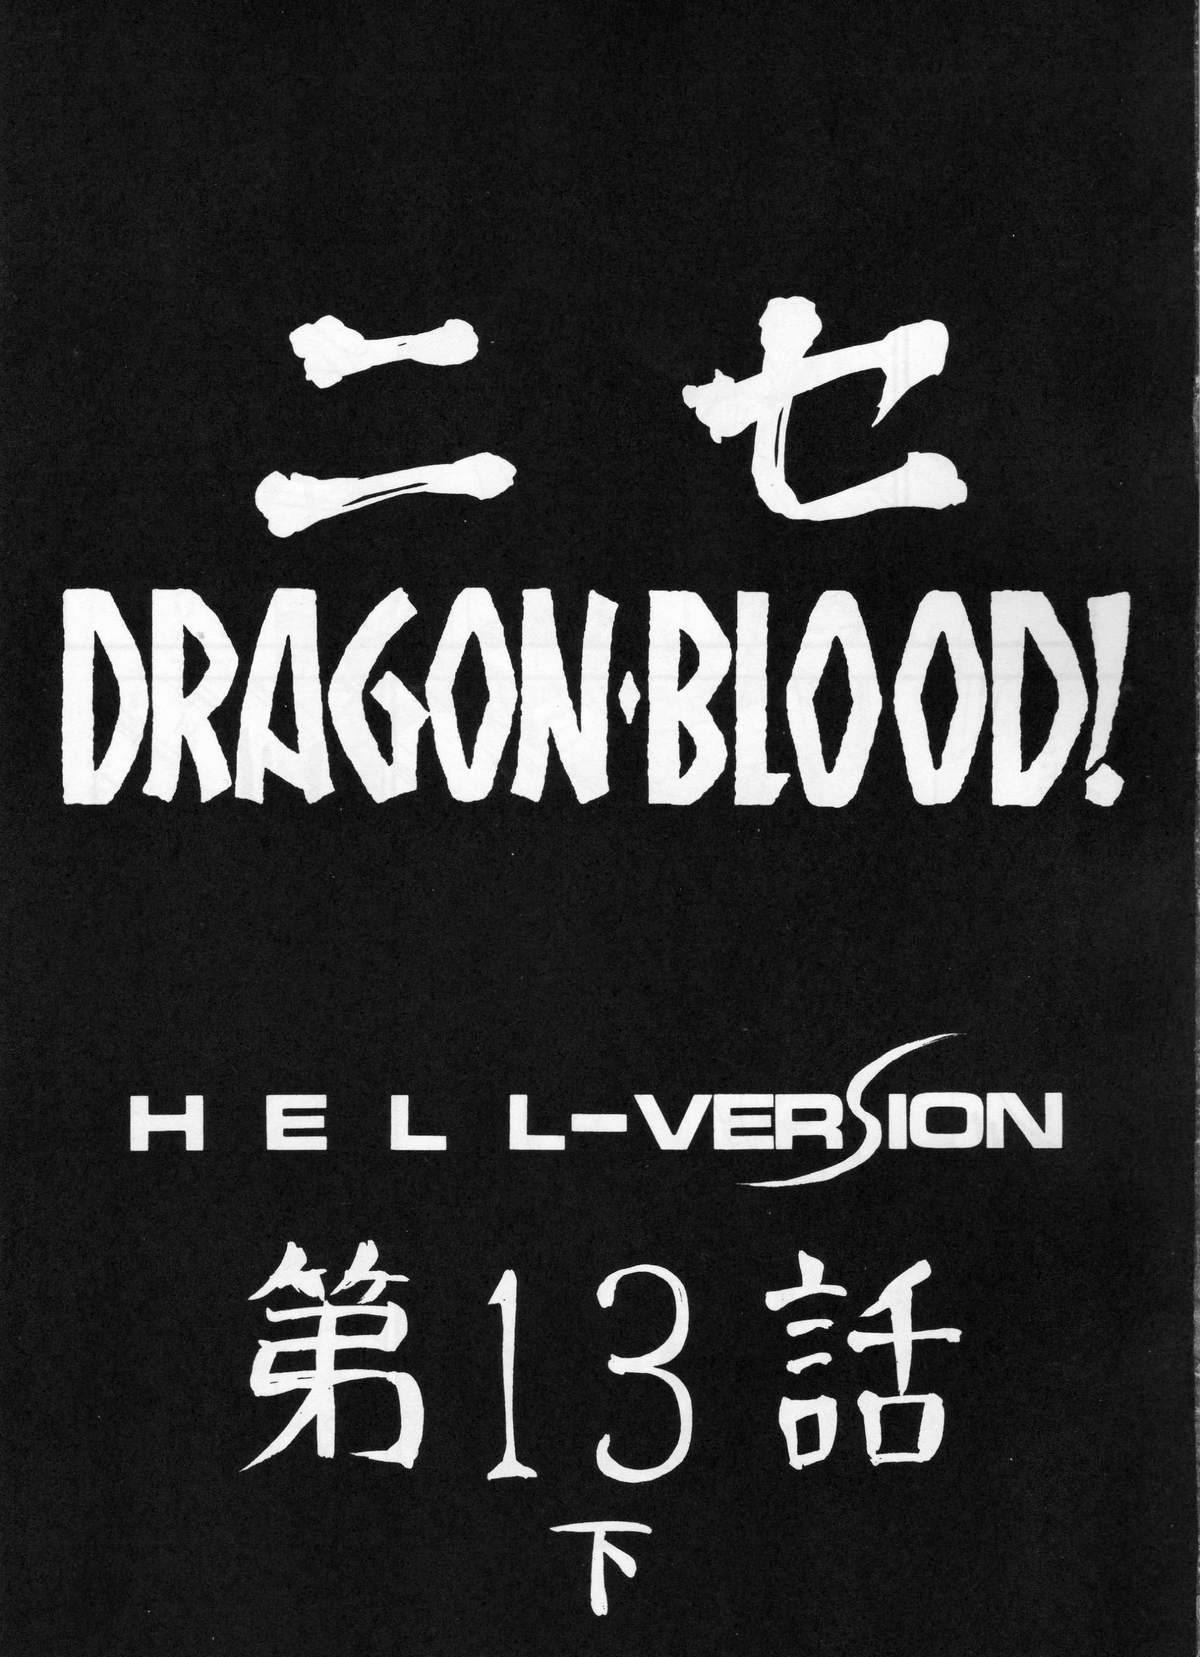 Nise Dragon Blood! 13 1/2 9